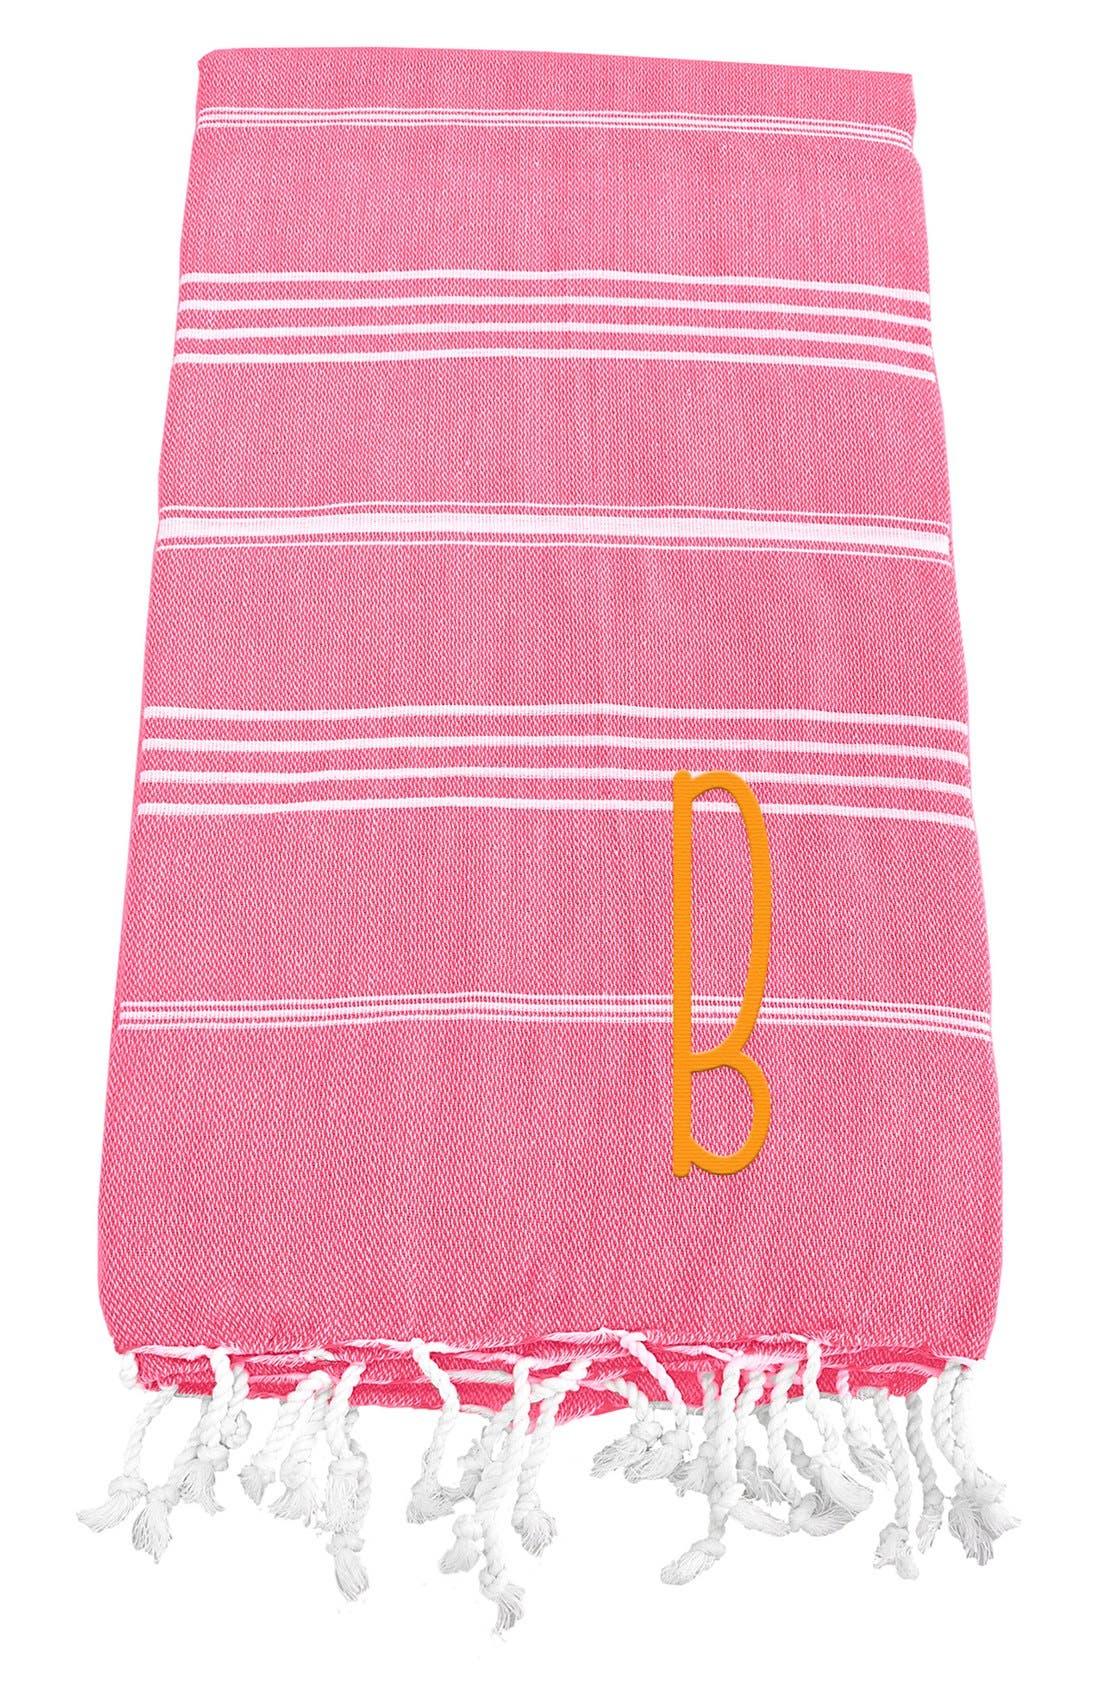 Cathyu0027s Concepts Monogram Turkish Cotton Towel